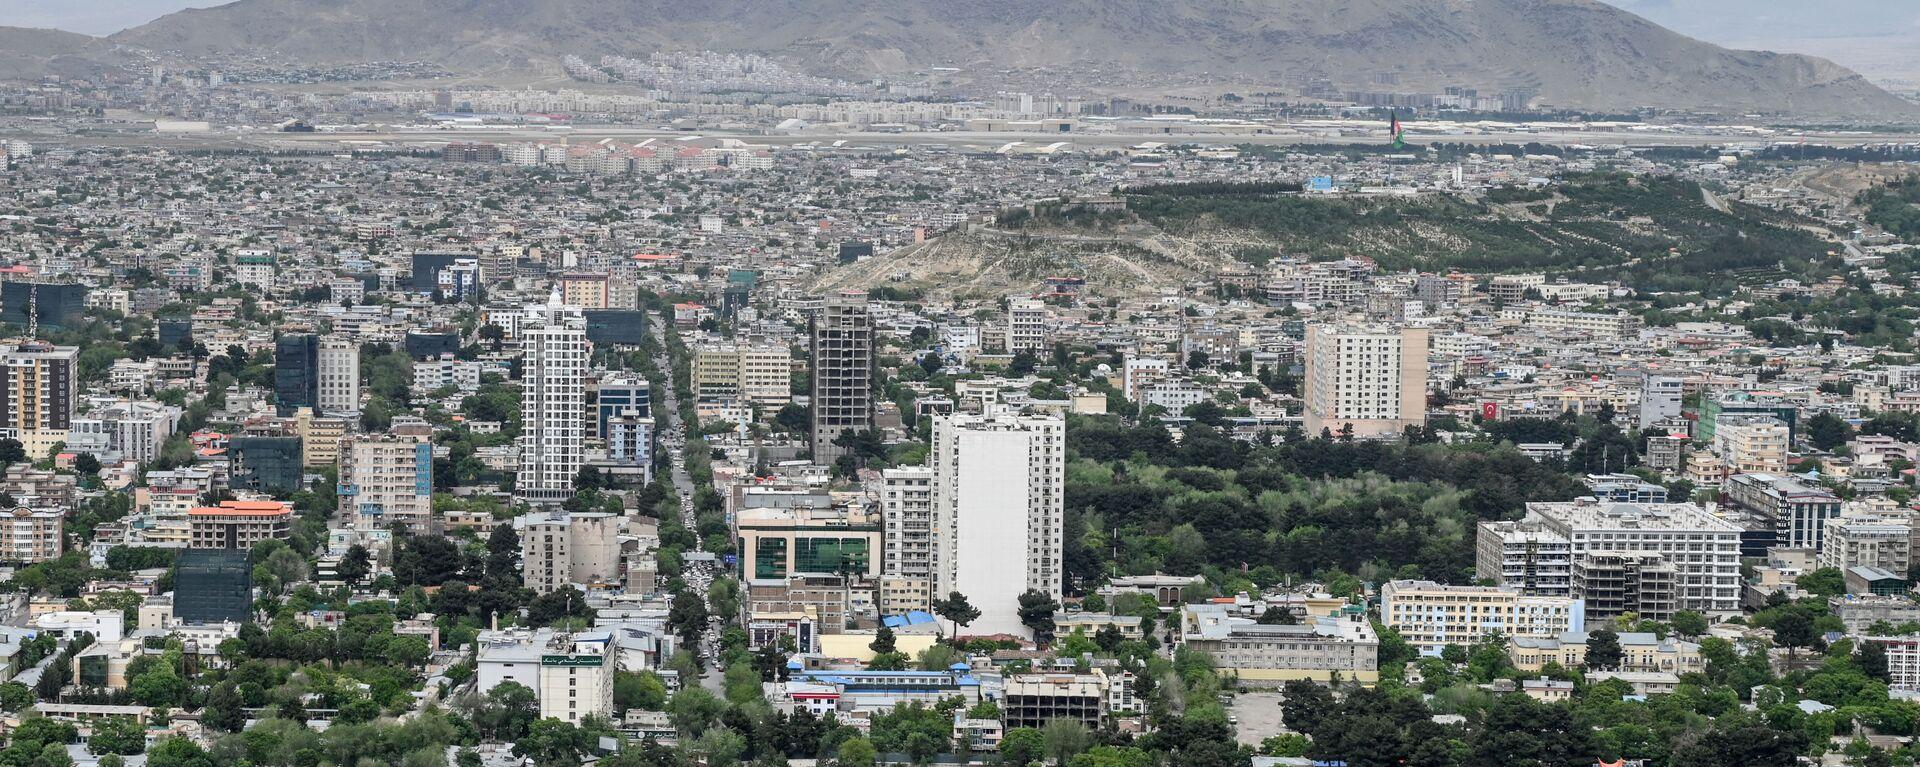 Вид на Кабул, фото из архива - Sputnik Азербайджан, 1920, 13.01.2021